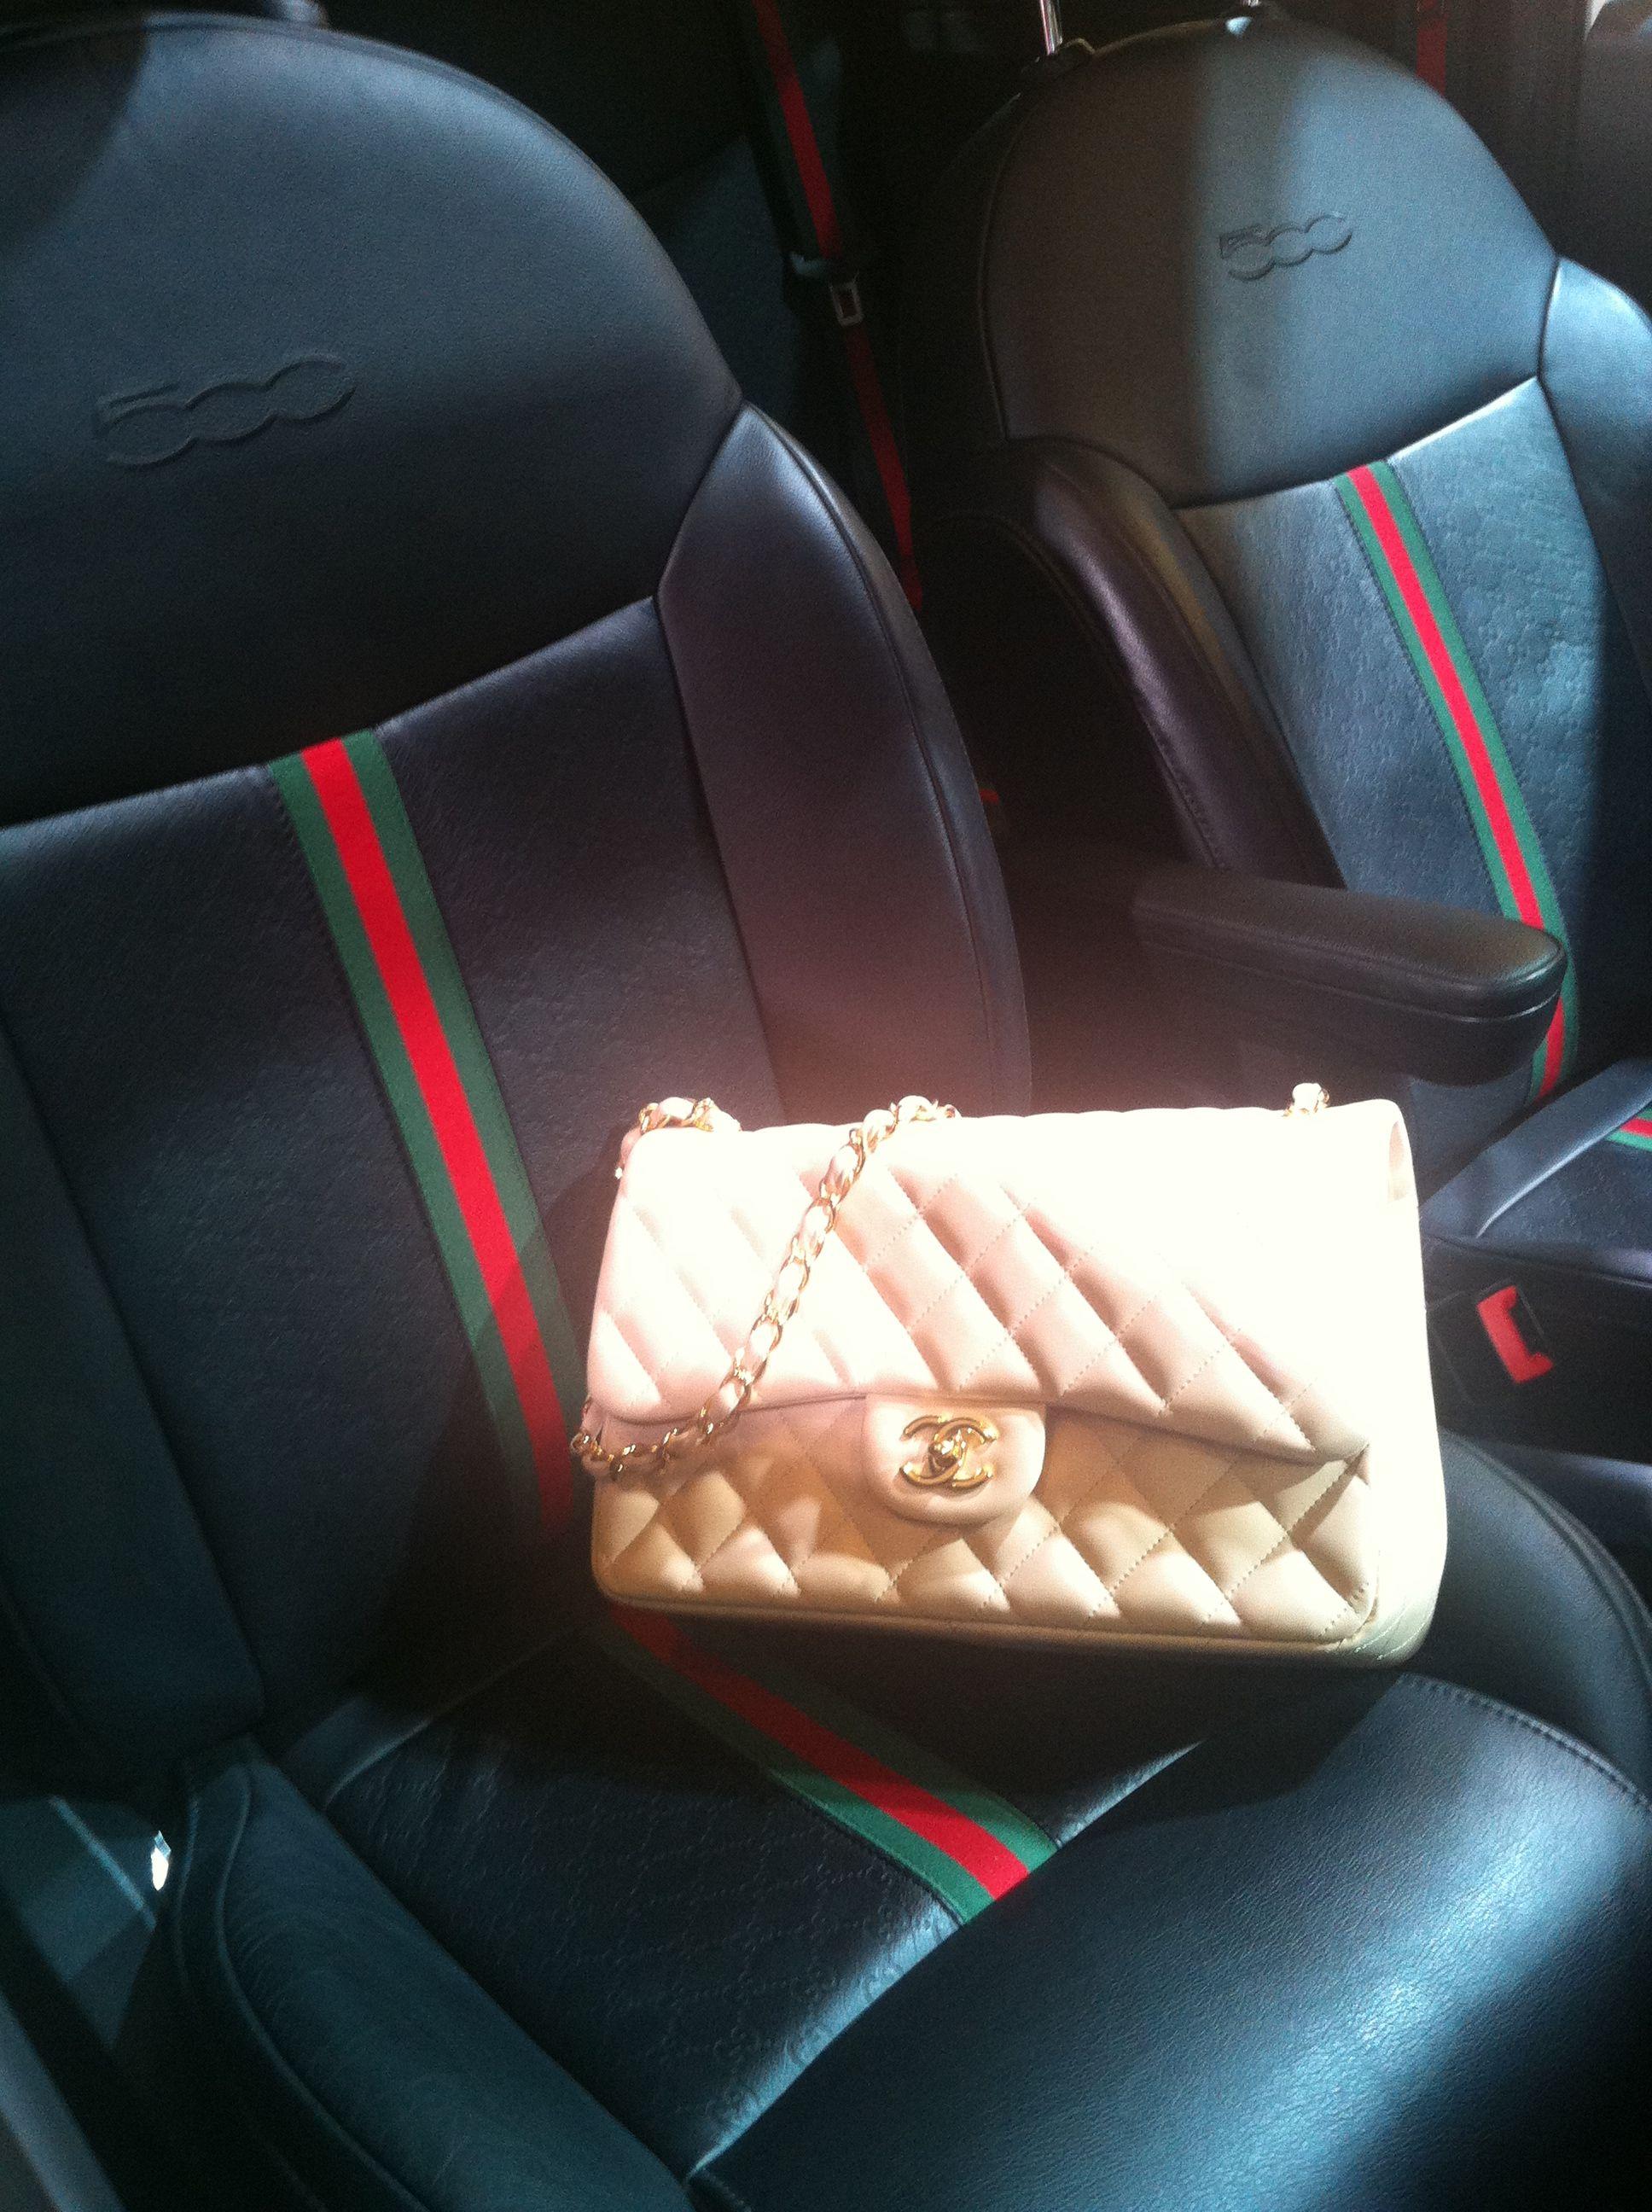 Fiat 500 Gucci edition  NYAutoShowBags  Chanel  handbagchallenge ... I want  a Gucci car AND a matching bag! 15a7b34e2ed89